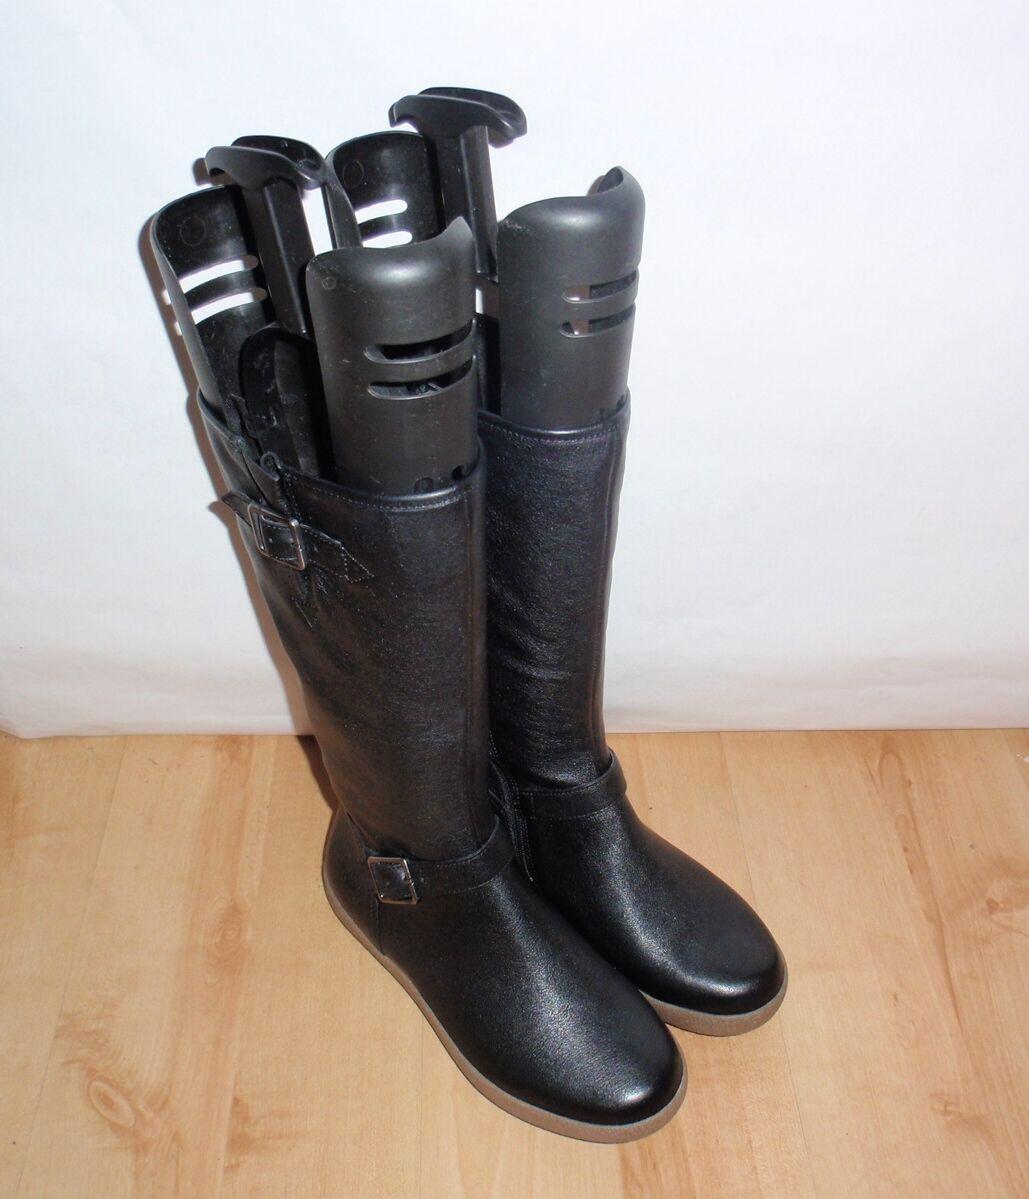 NEU Clarks active air Damenss NECK SPARKLE schwarz Leder boots Größe 4 D EU 37